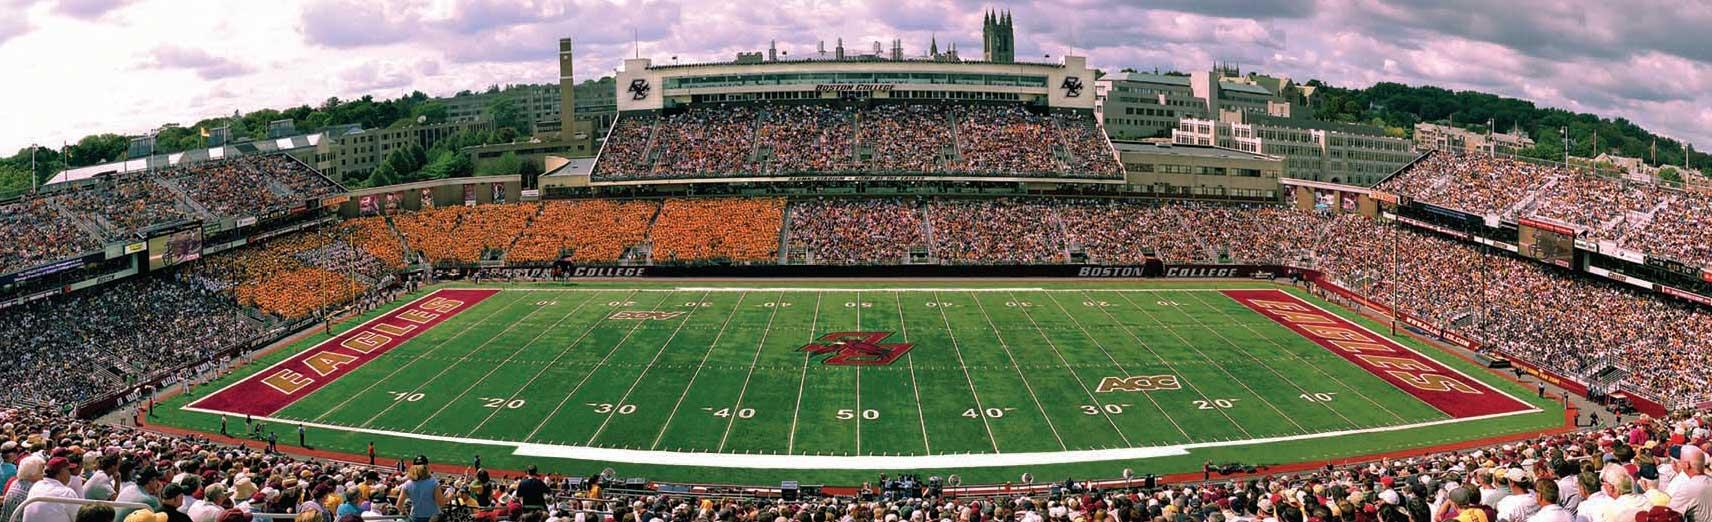 University sports application USA